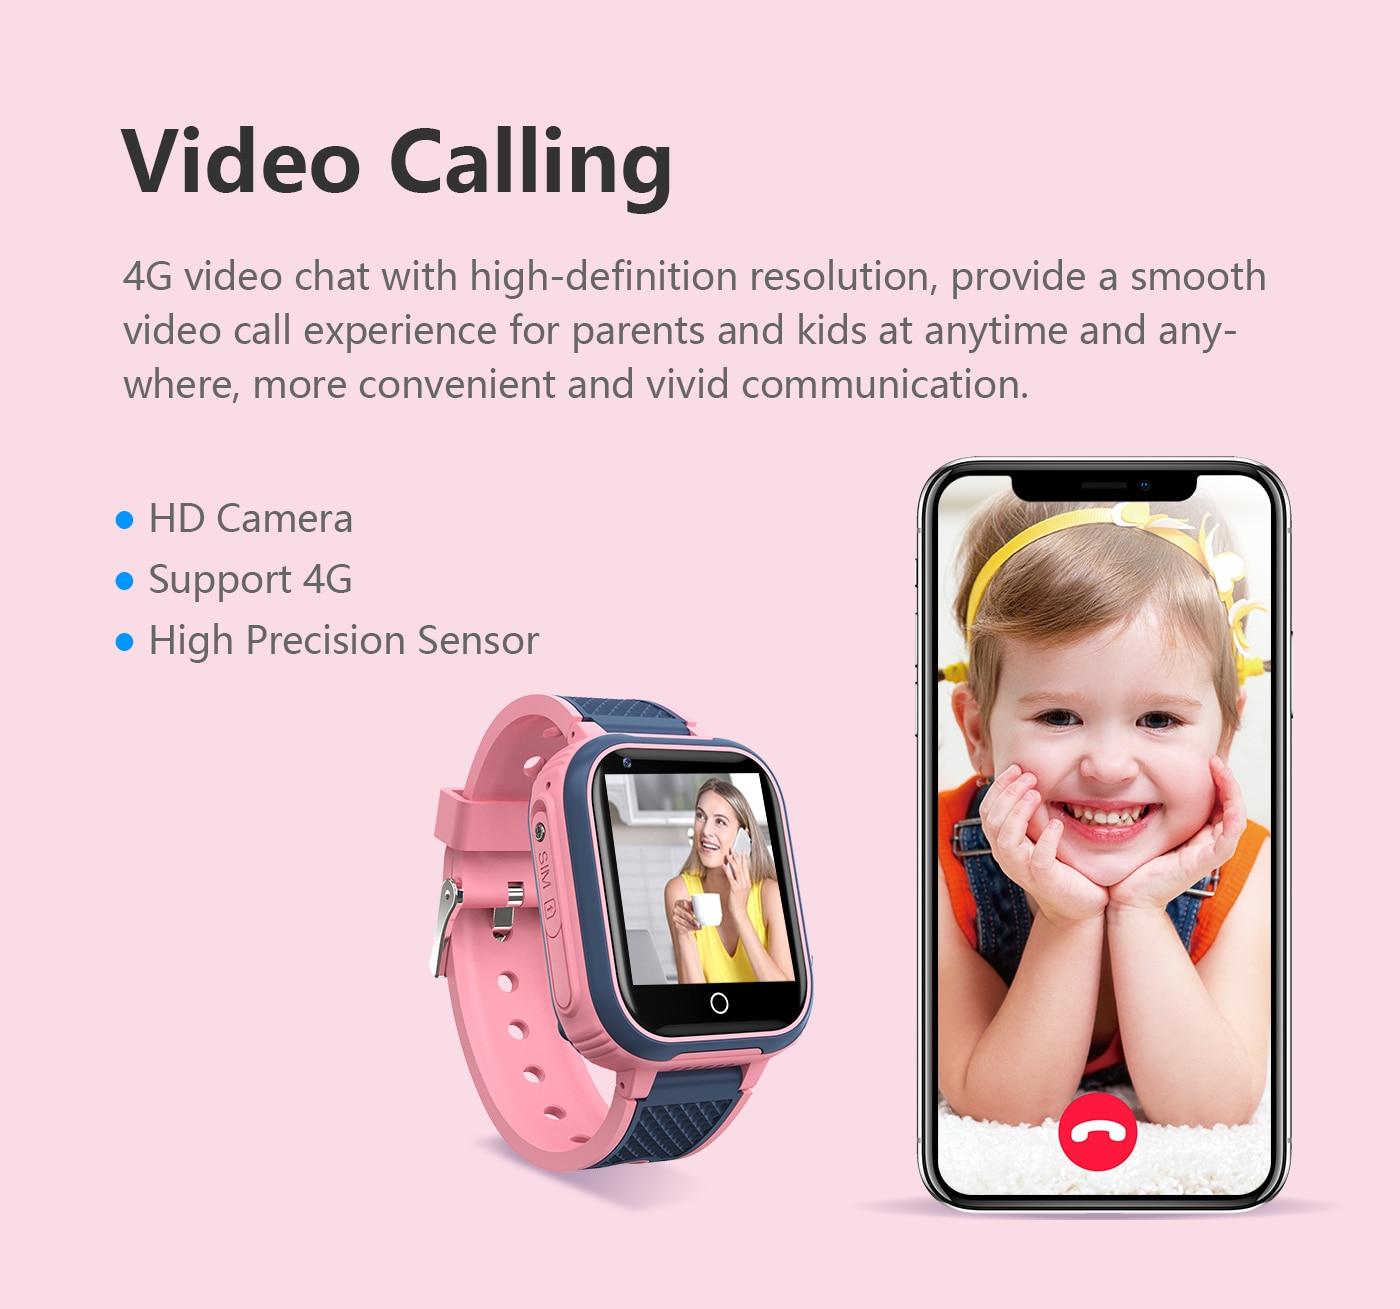 H6aad8110968e436b80fb88636ce78b73O LT21 4G Smart Watch Kids GPS WIFI Video Call SOS IP67 Waterproof Child Smartwatch Camera Monitor Tracker Location Phone Watch